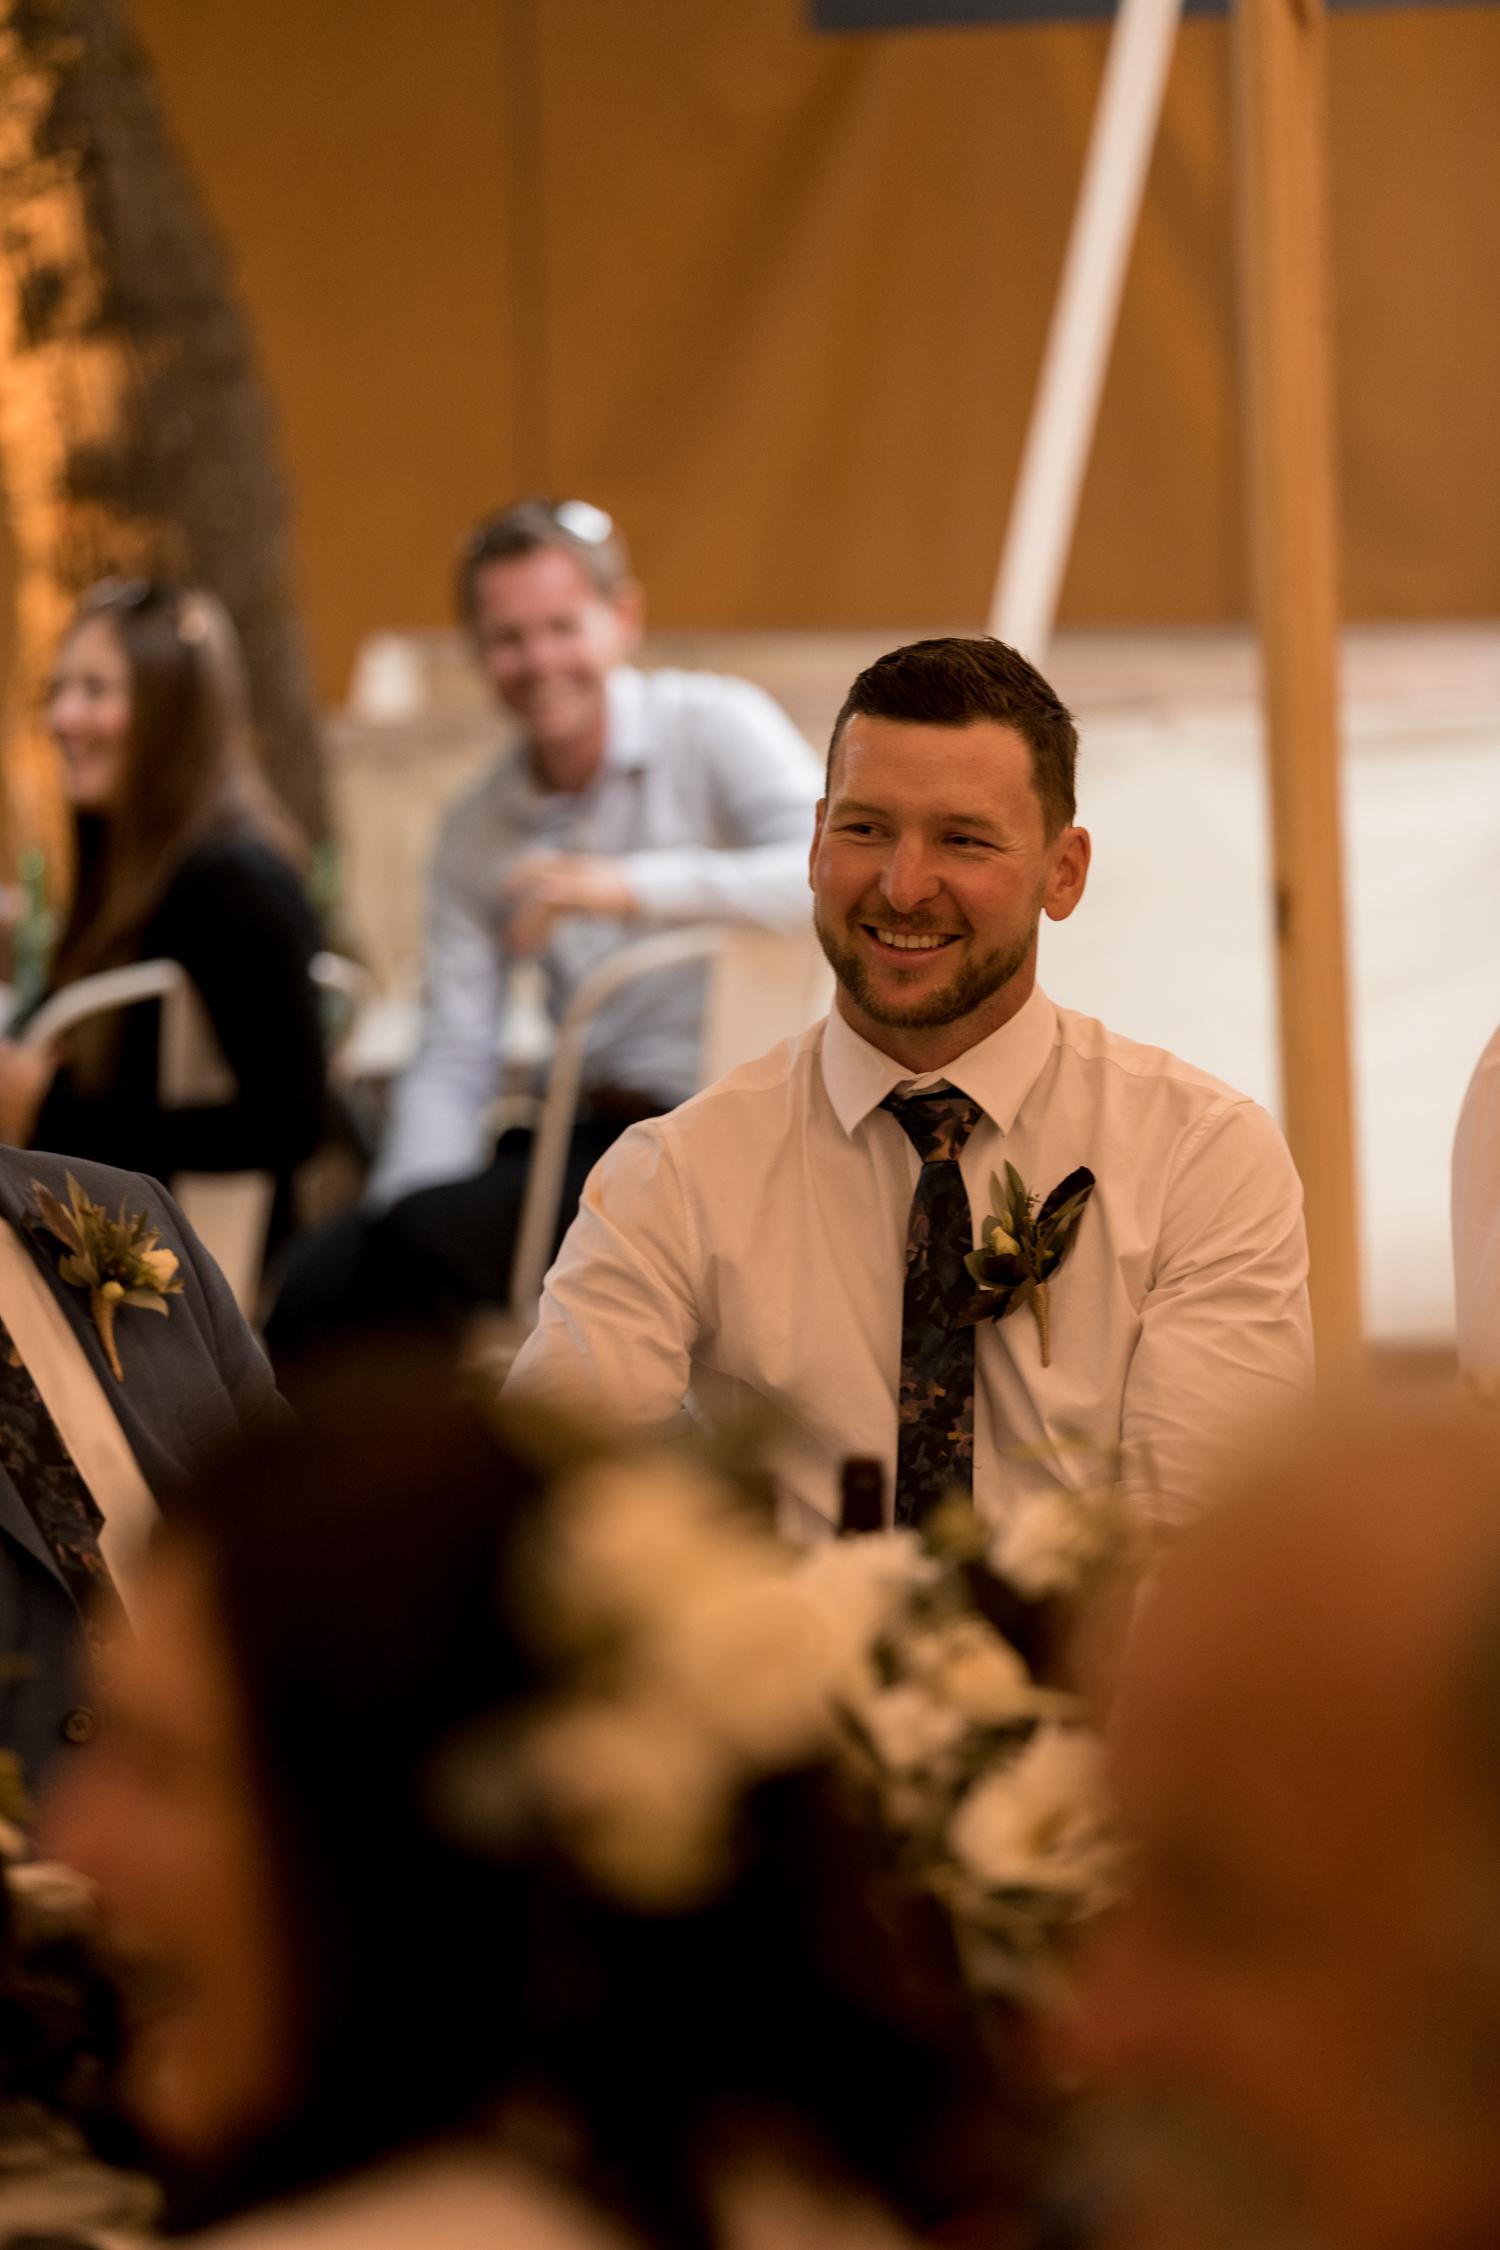 black-barn-winery-wedding-hawkes-bay-wedding-photographer-best-man-laughing.jpg